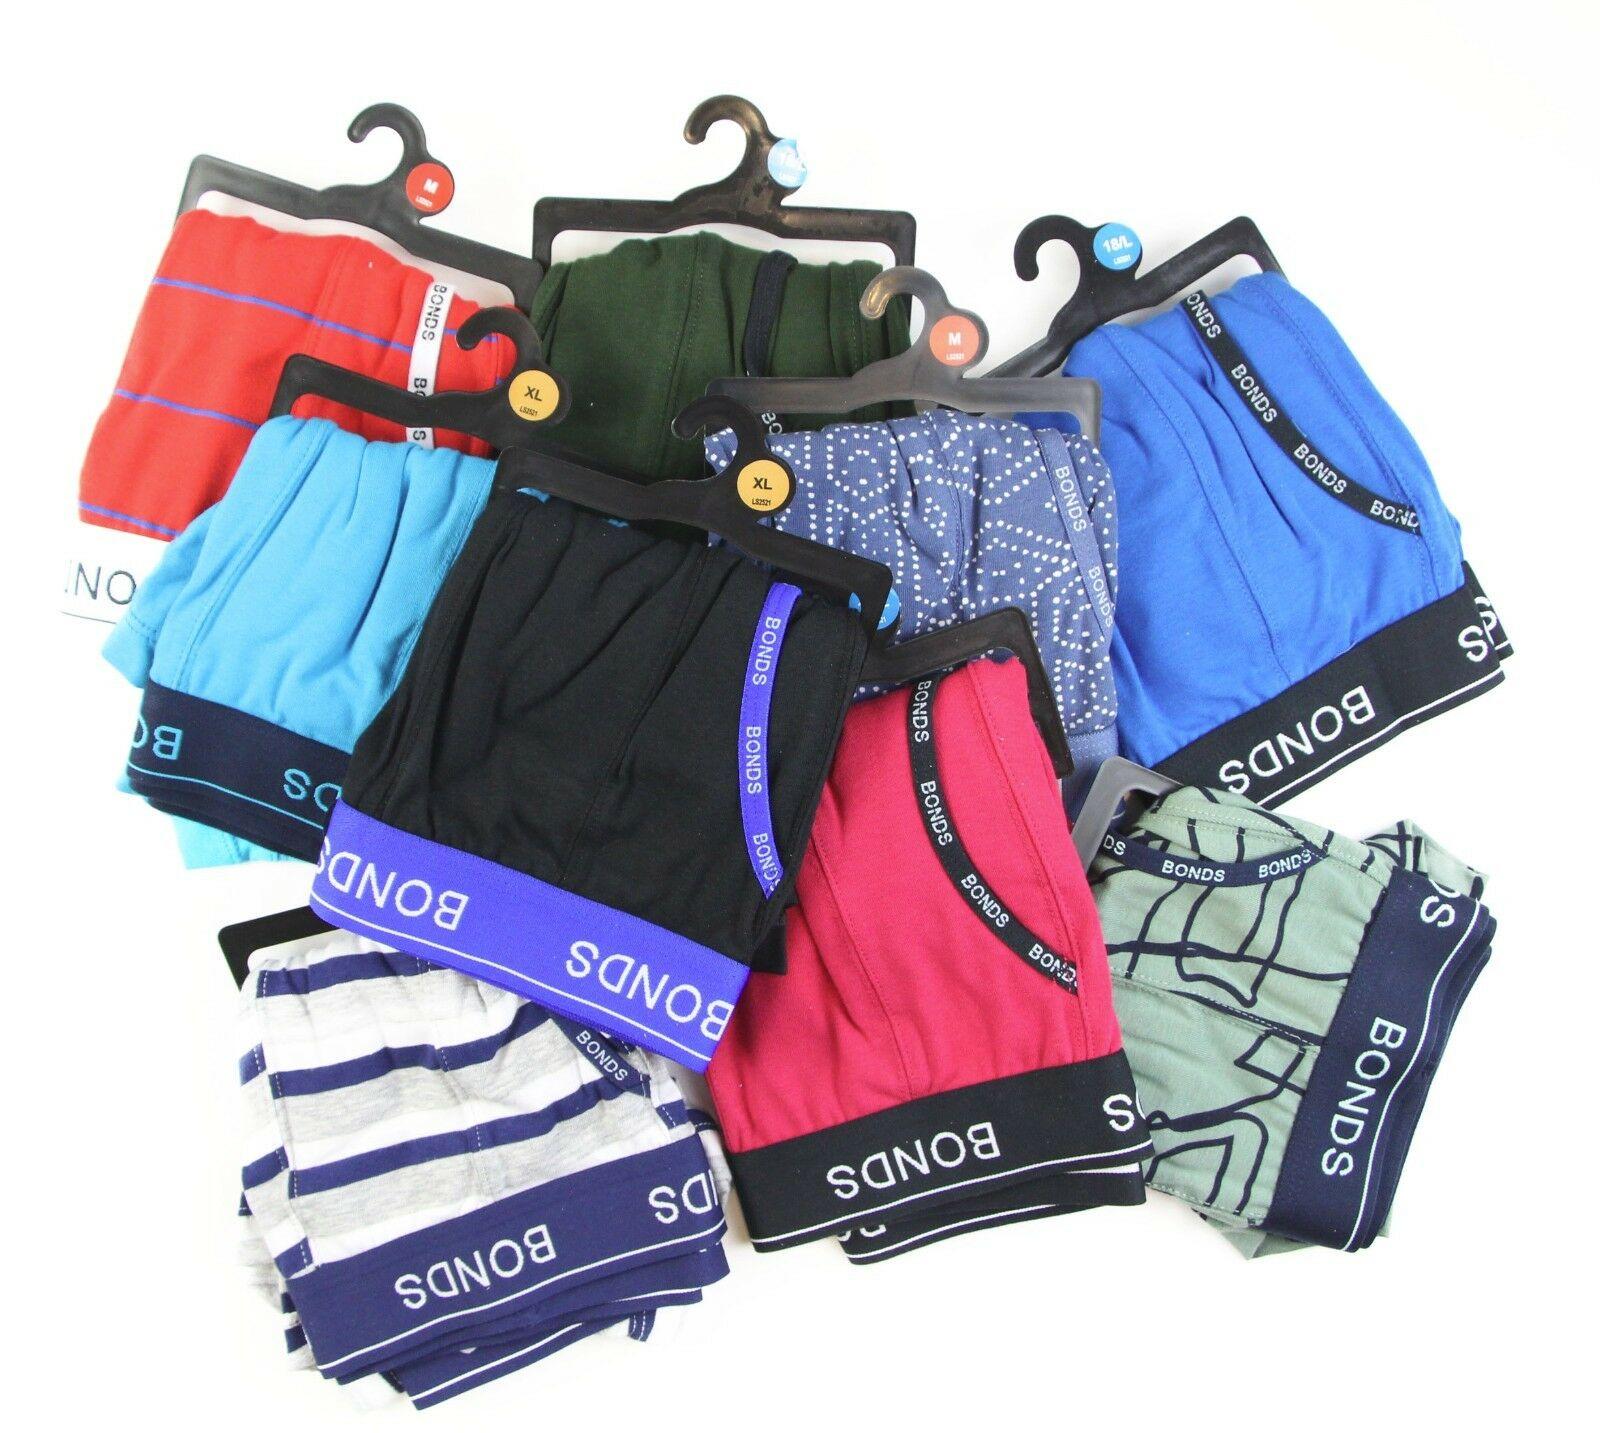 5-20-pairs-x-MENS-BONDS-UNDERWEAR-Guyfront-Trunks-Briefs-Boxer-Shorts-Size-S-XXL thumbnail 11